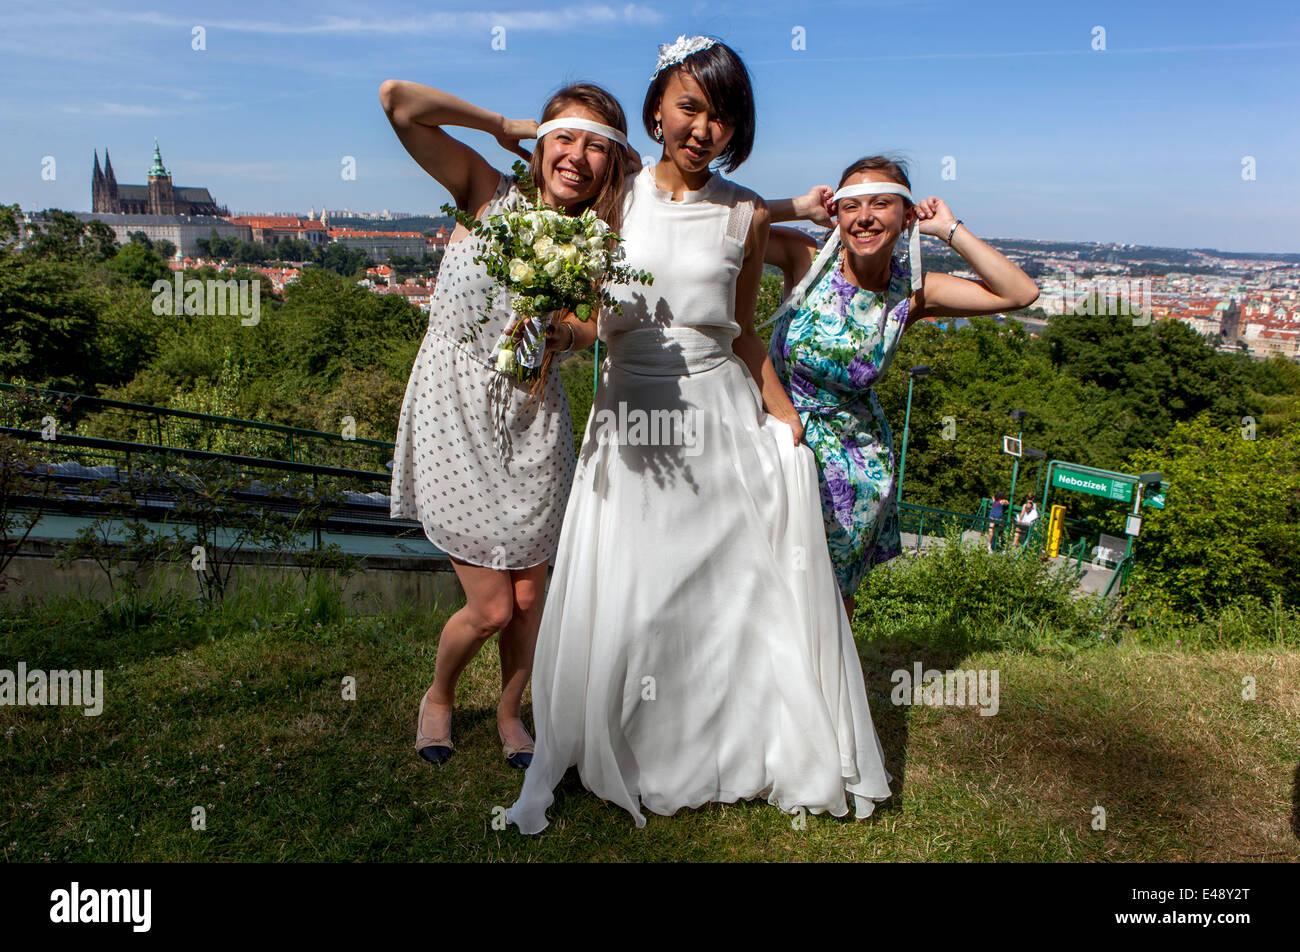 Russian Wedding Stock Photos & Russian Wedding Stock Images - Alamy